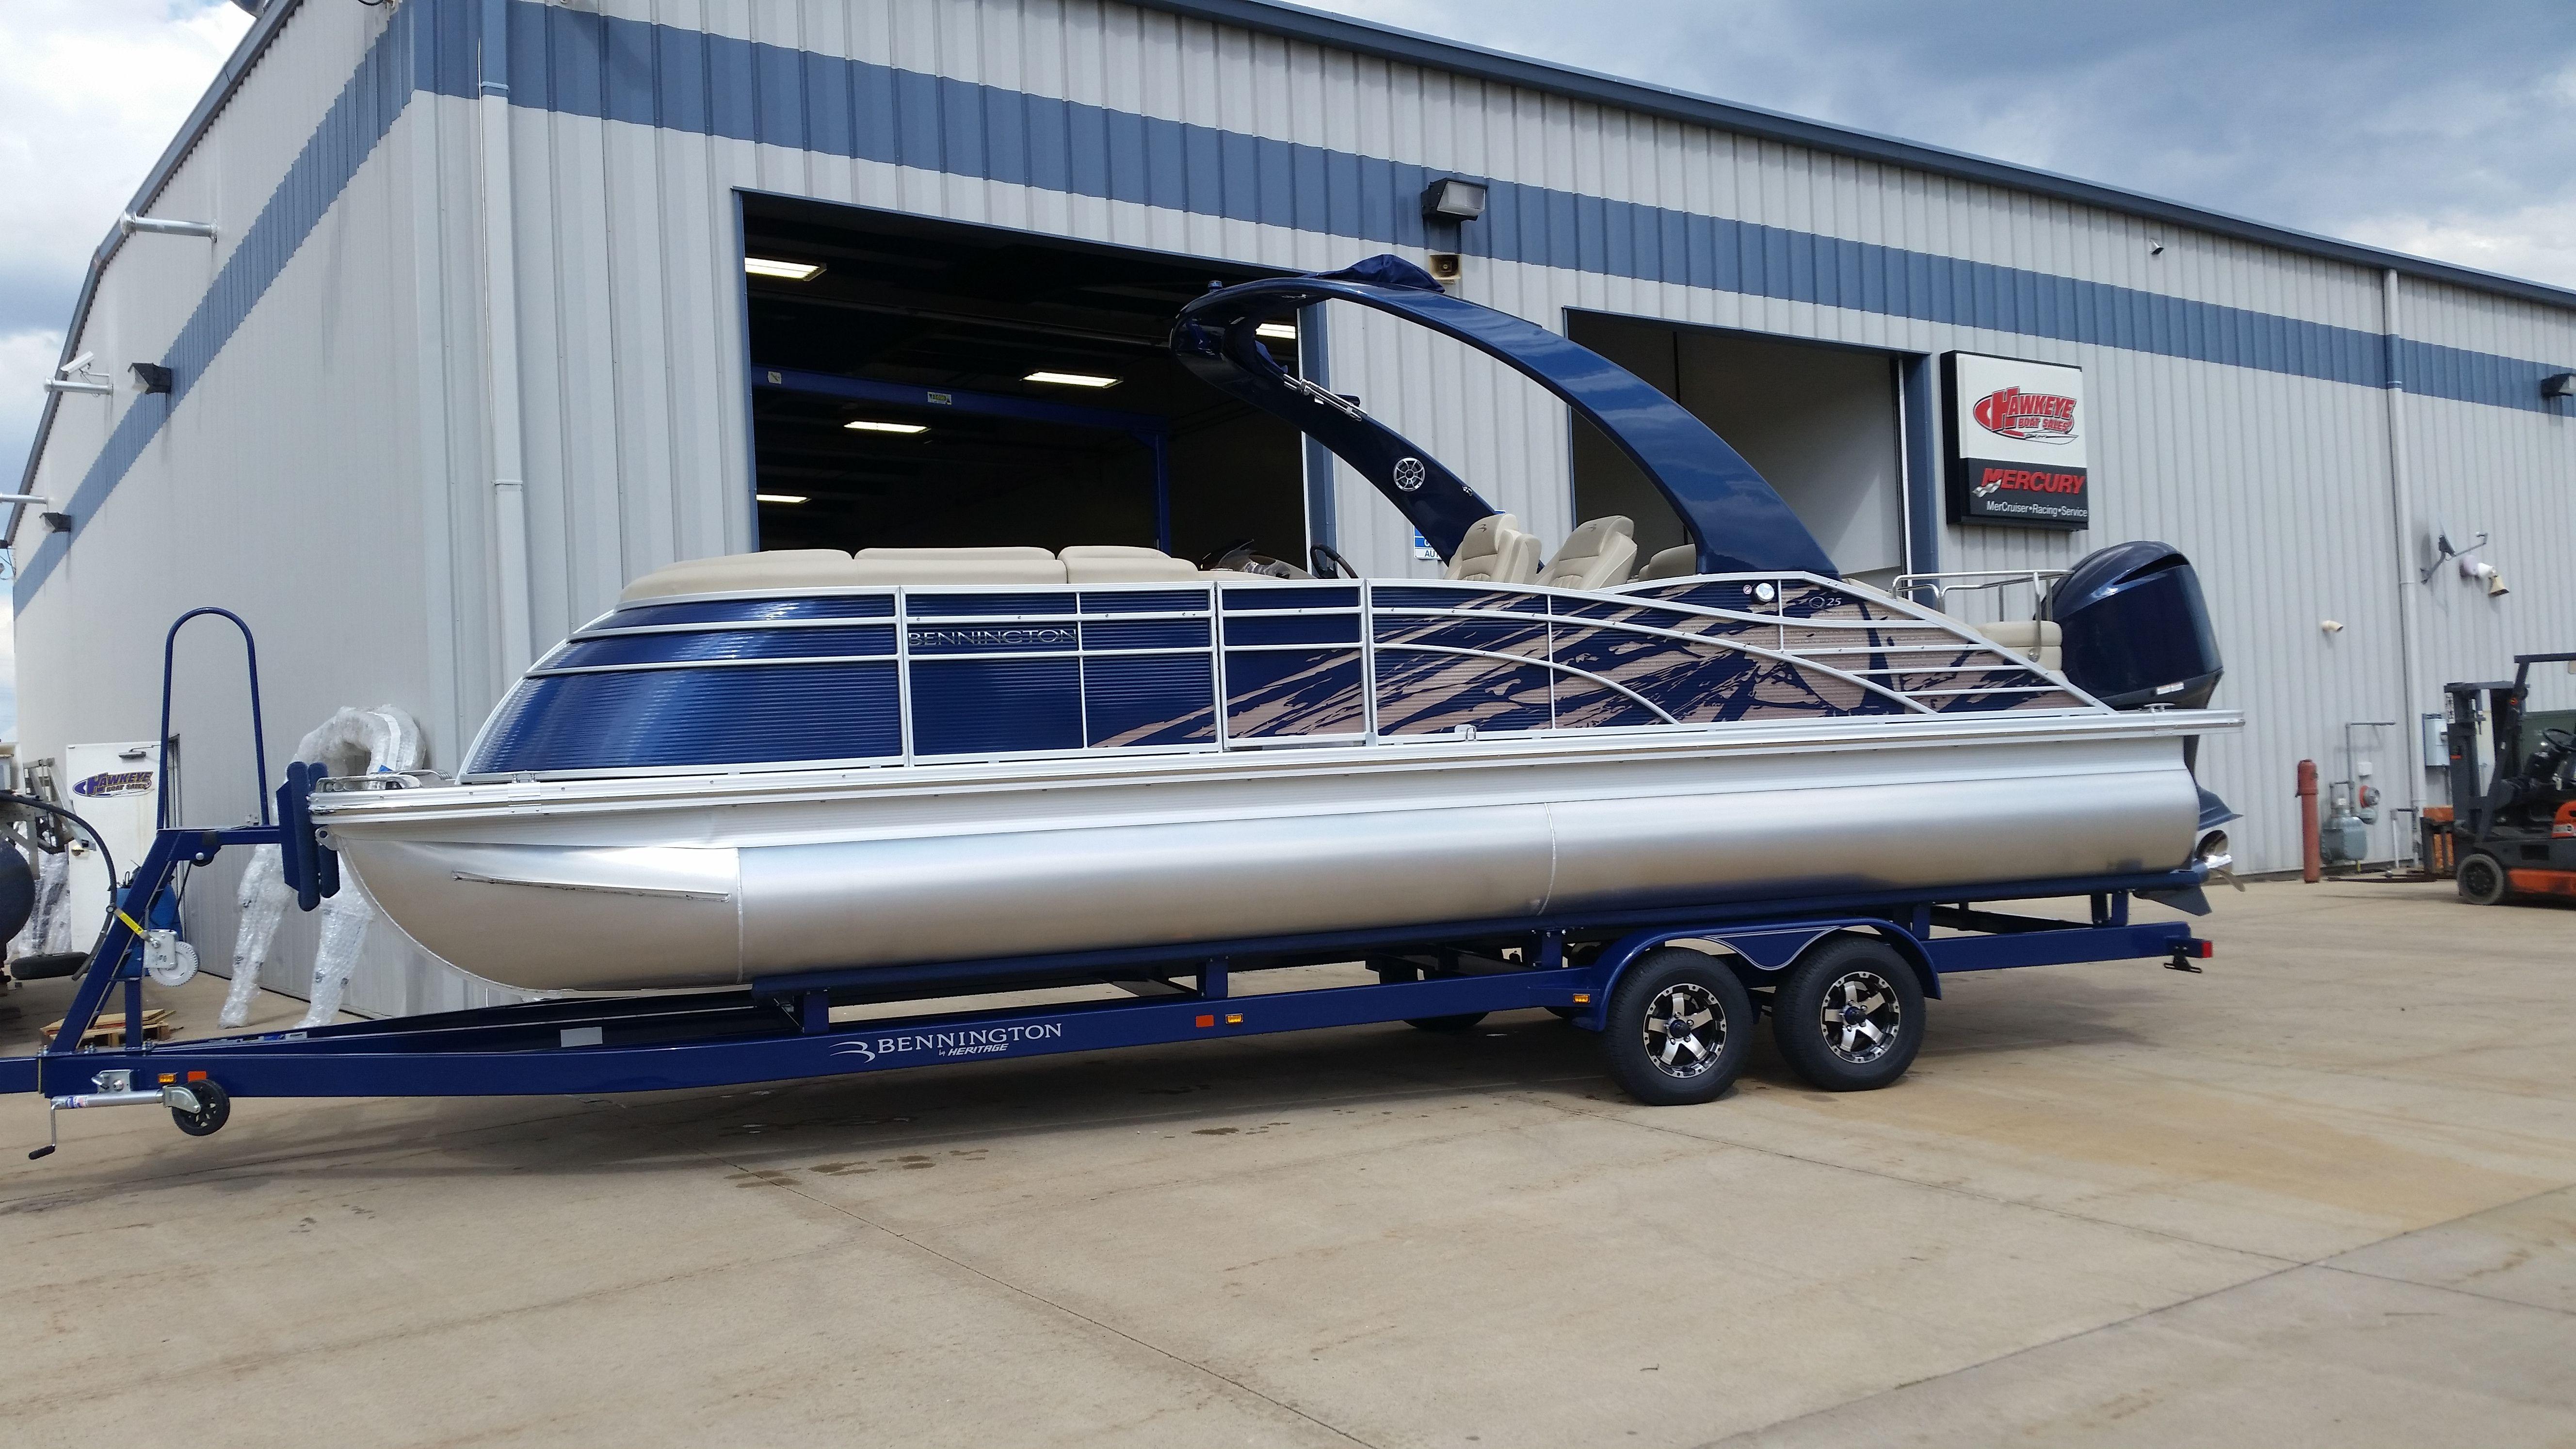 BENNINGTON w/ 350 HP YAMAHA (V8) Outboard Motor